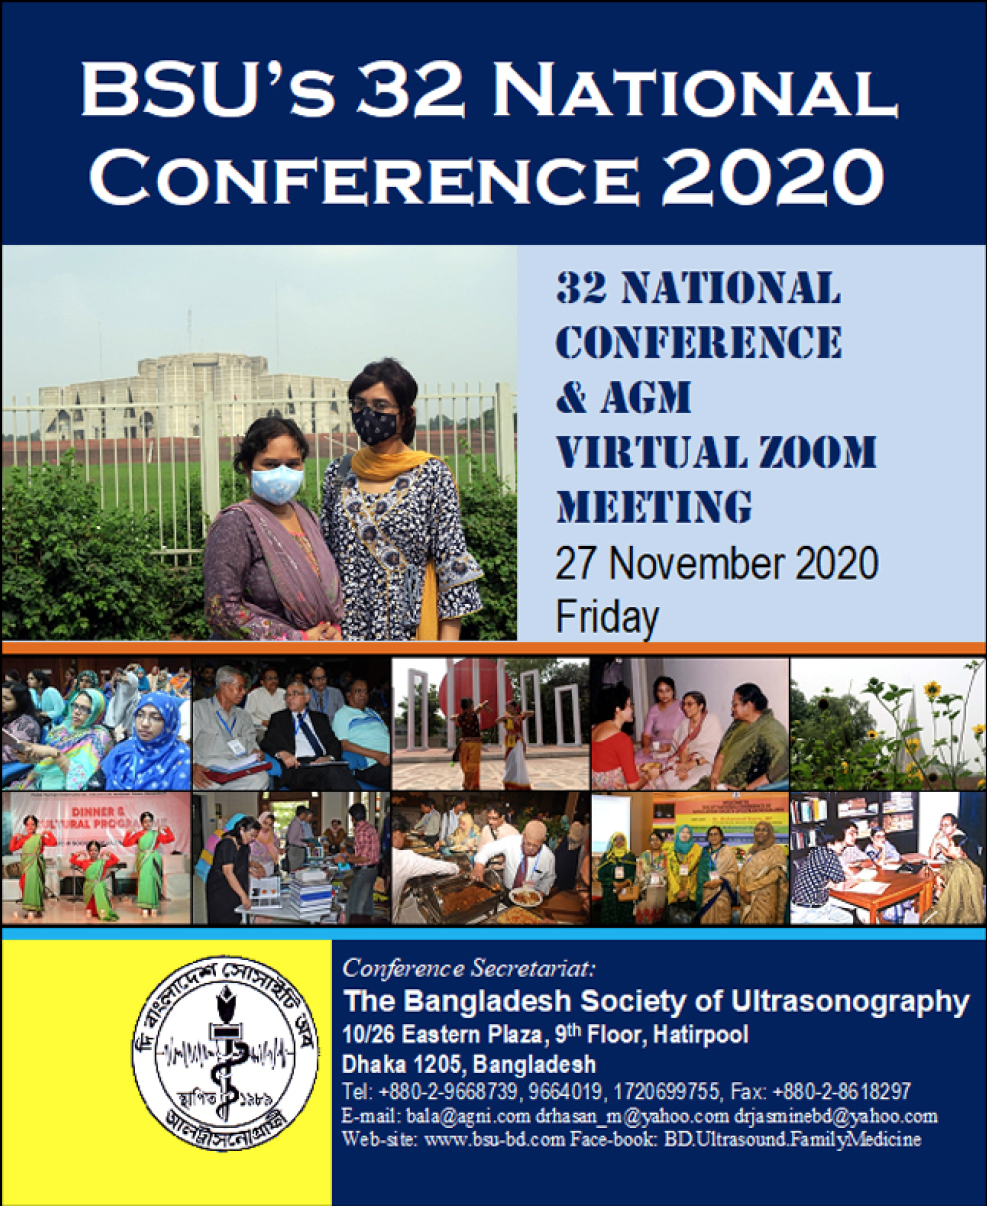 BANGLADESH SOCIETY OF ULTRASONOGRAPHY 32ND NATIONAL CONFERENCE ON 27 NOVEMBER 2020